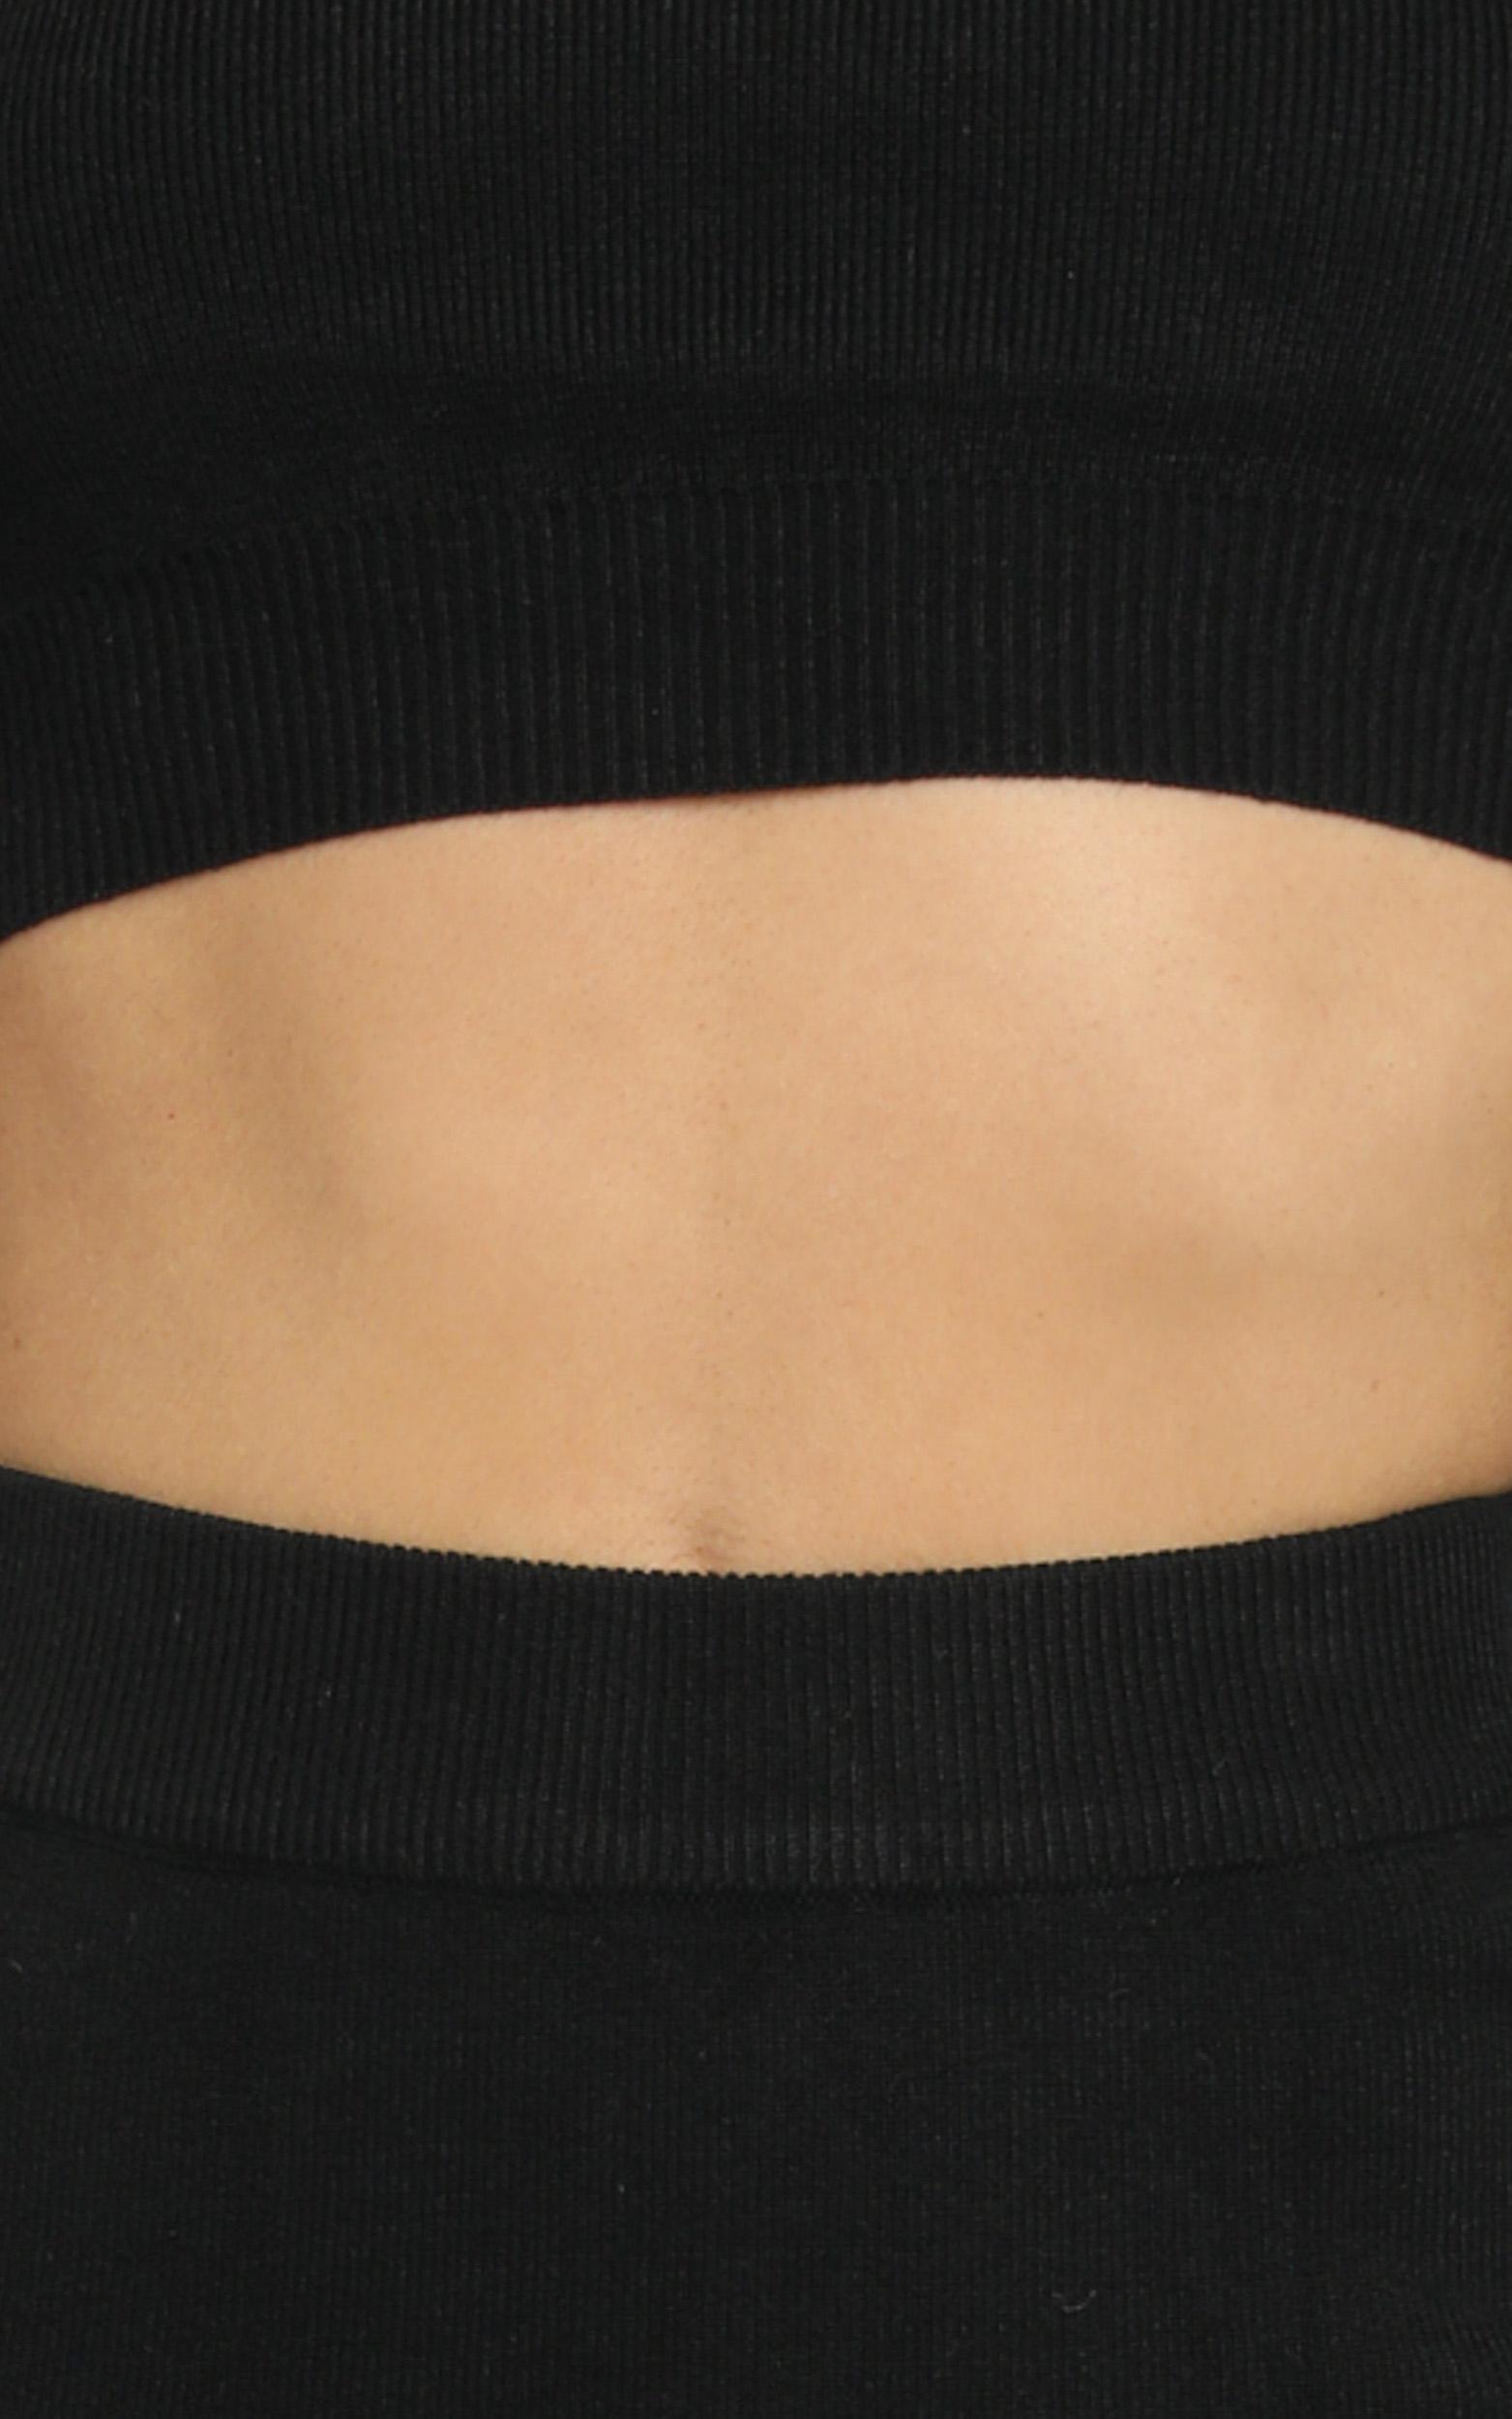 Tori Two Piece Set in Black - 12 (L), Black, hi-res image number null